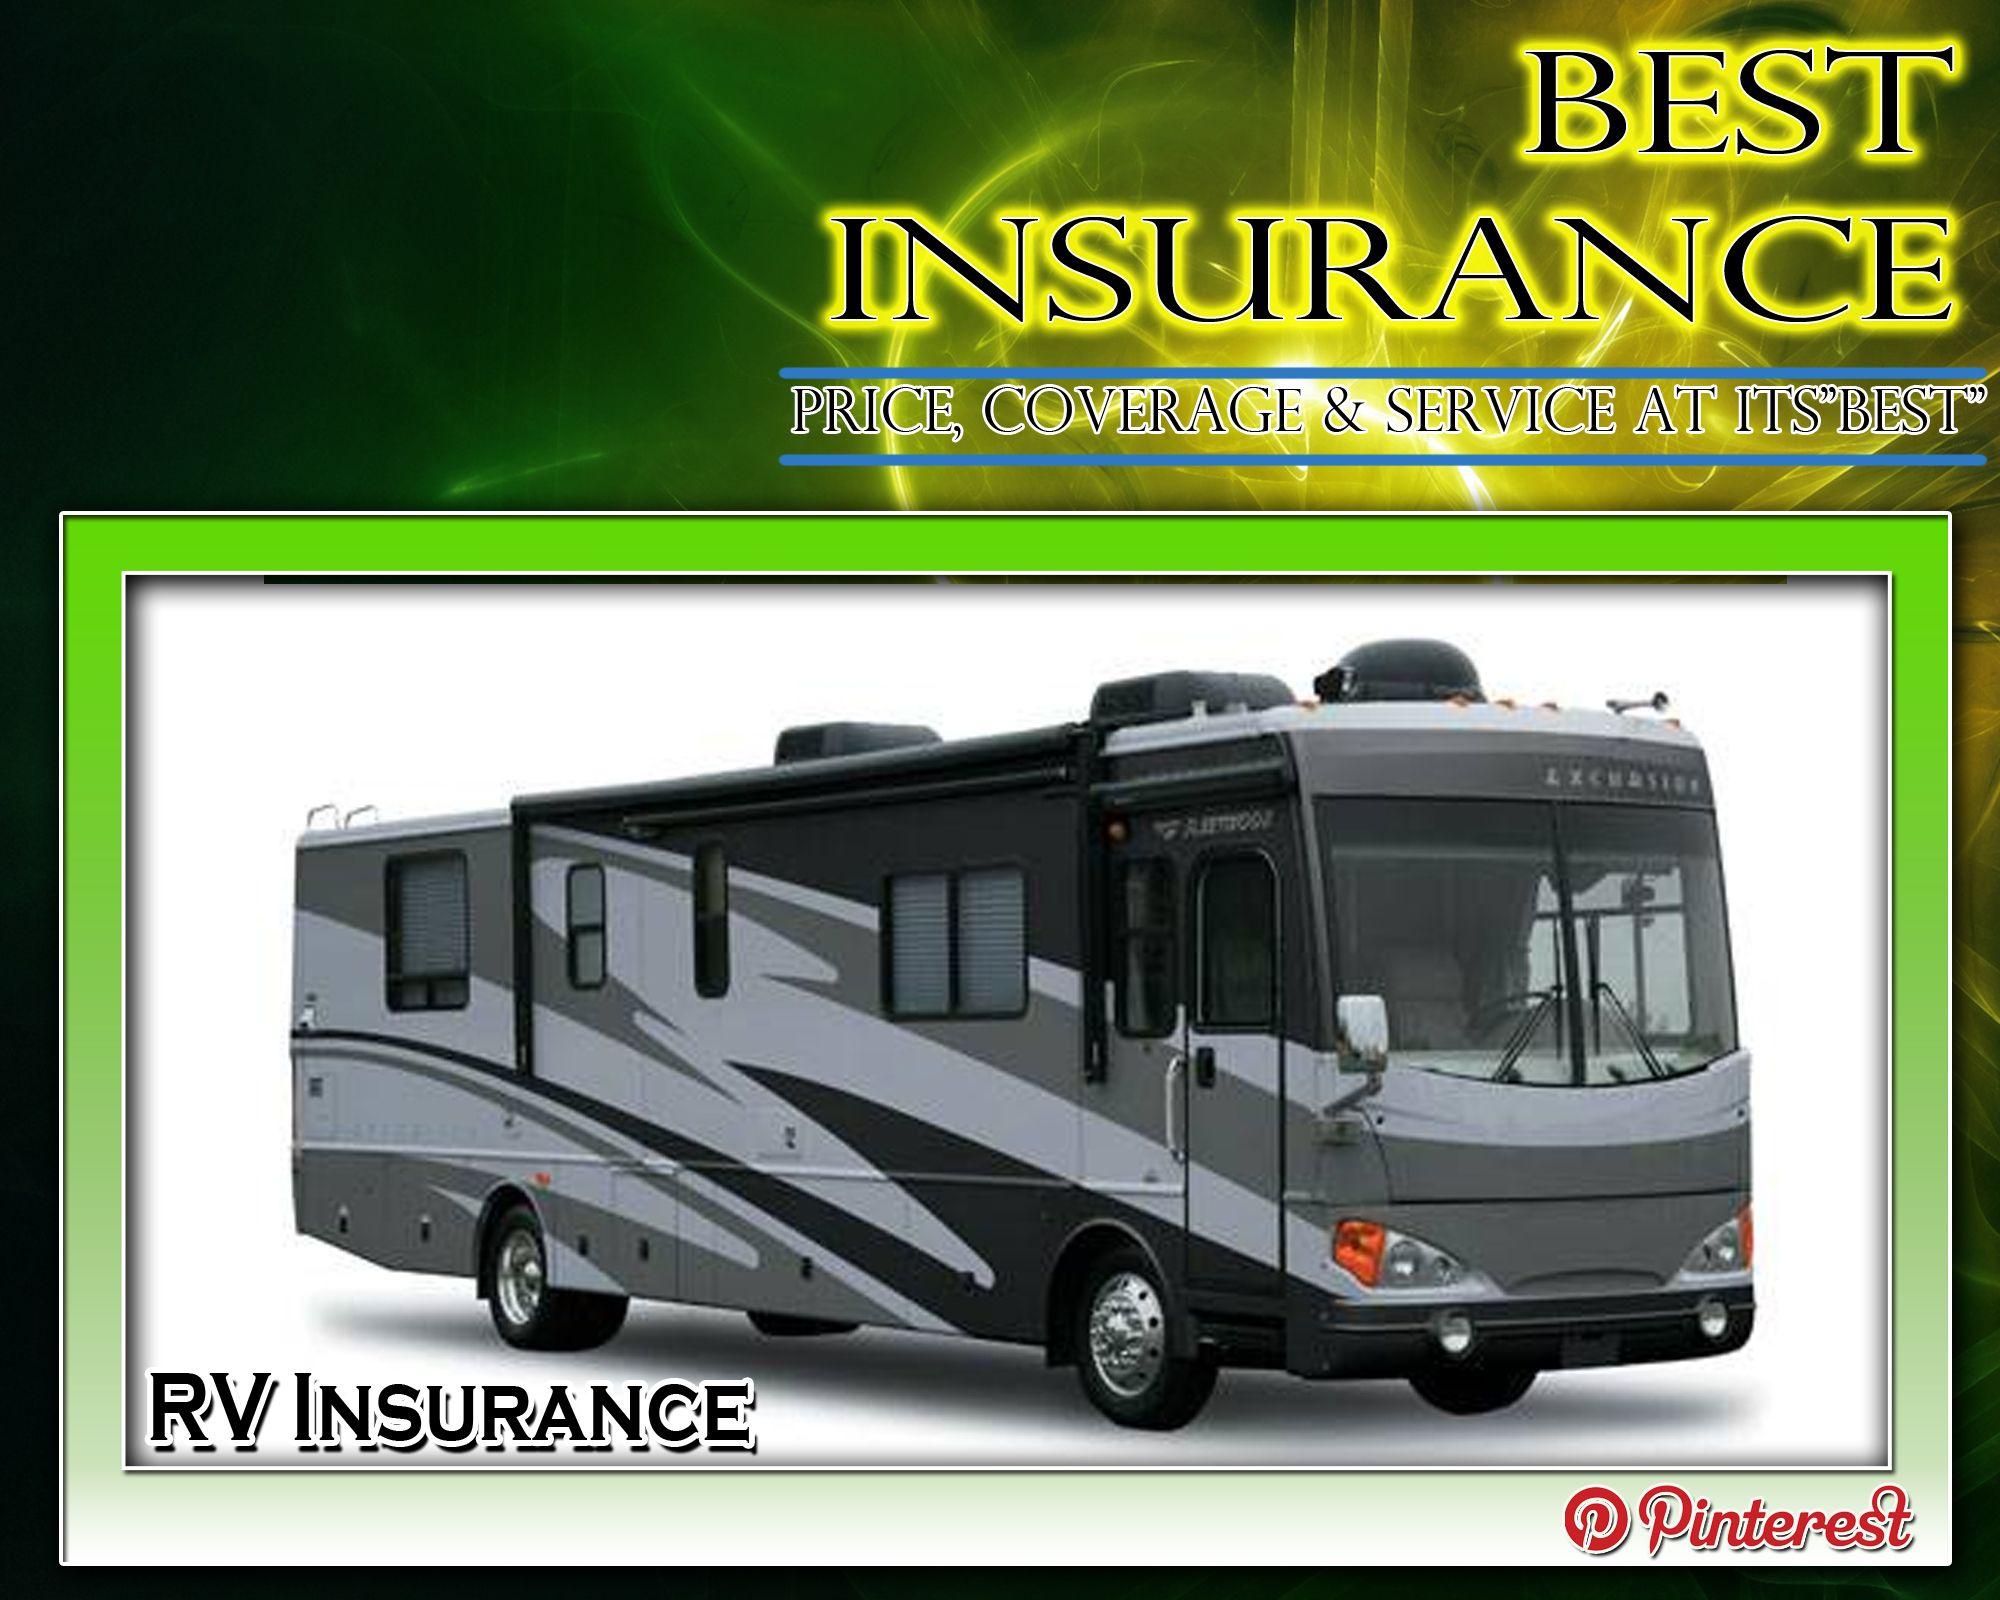 Homeownersinsuranceft Lauderdale Rv Insurance Rv Insurance Best